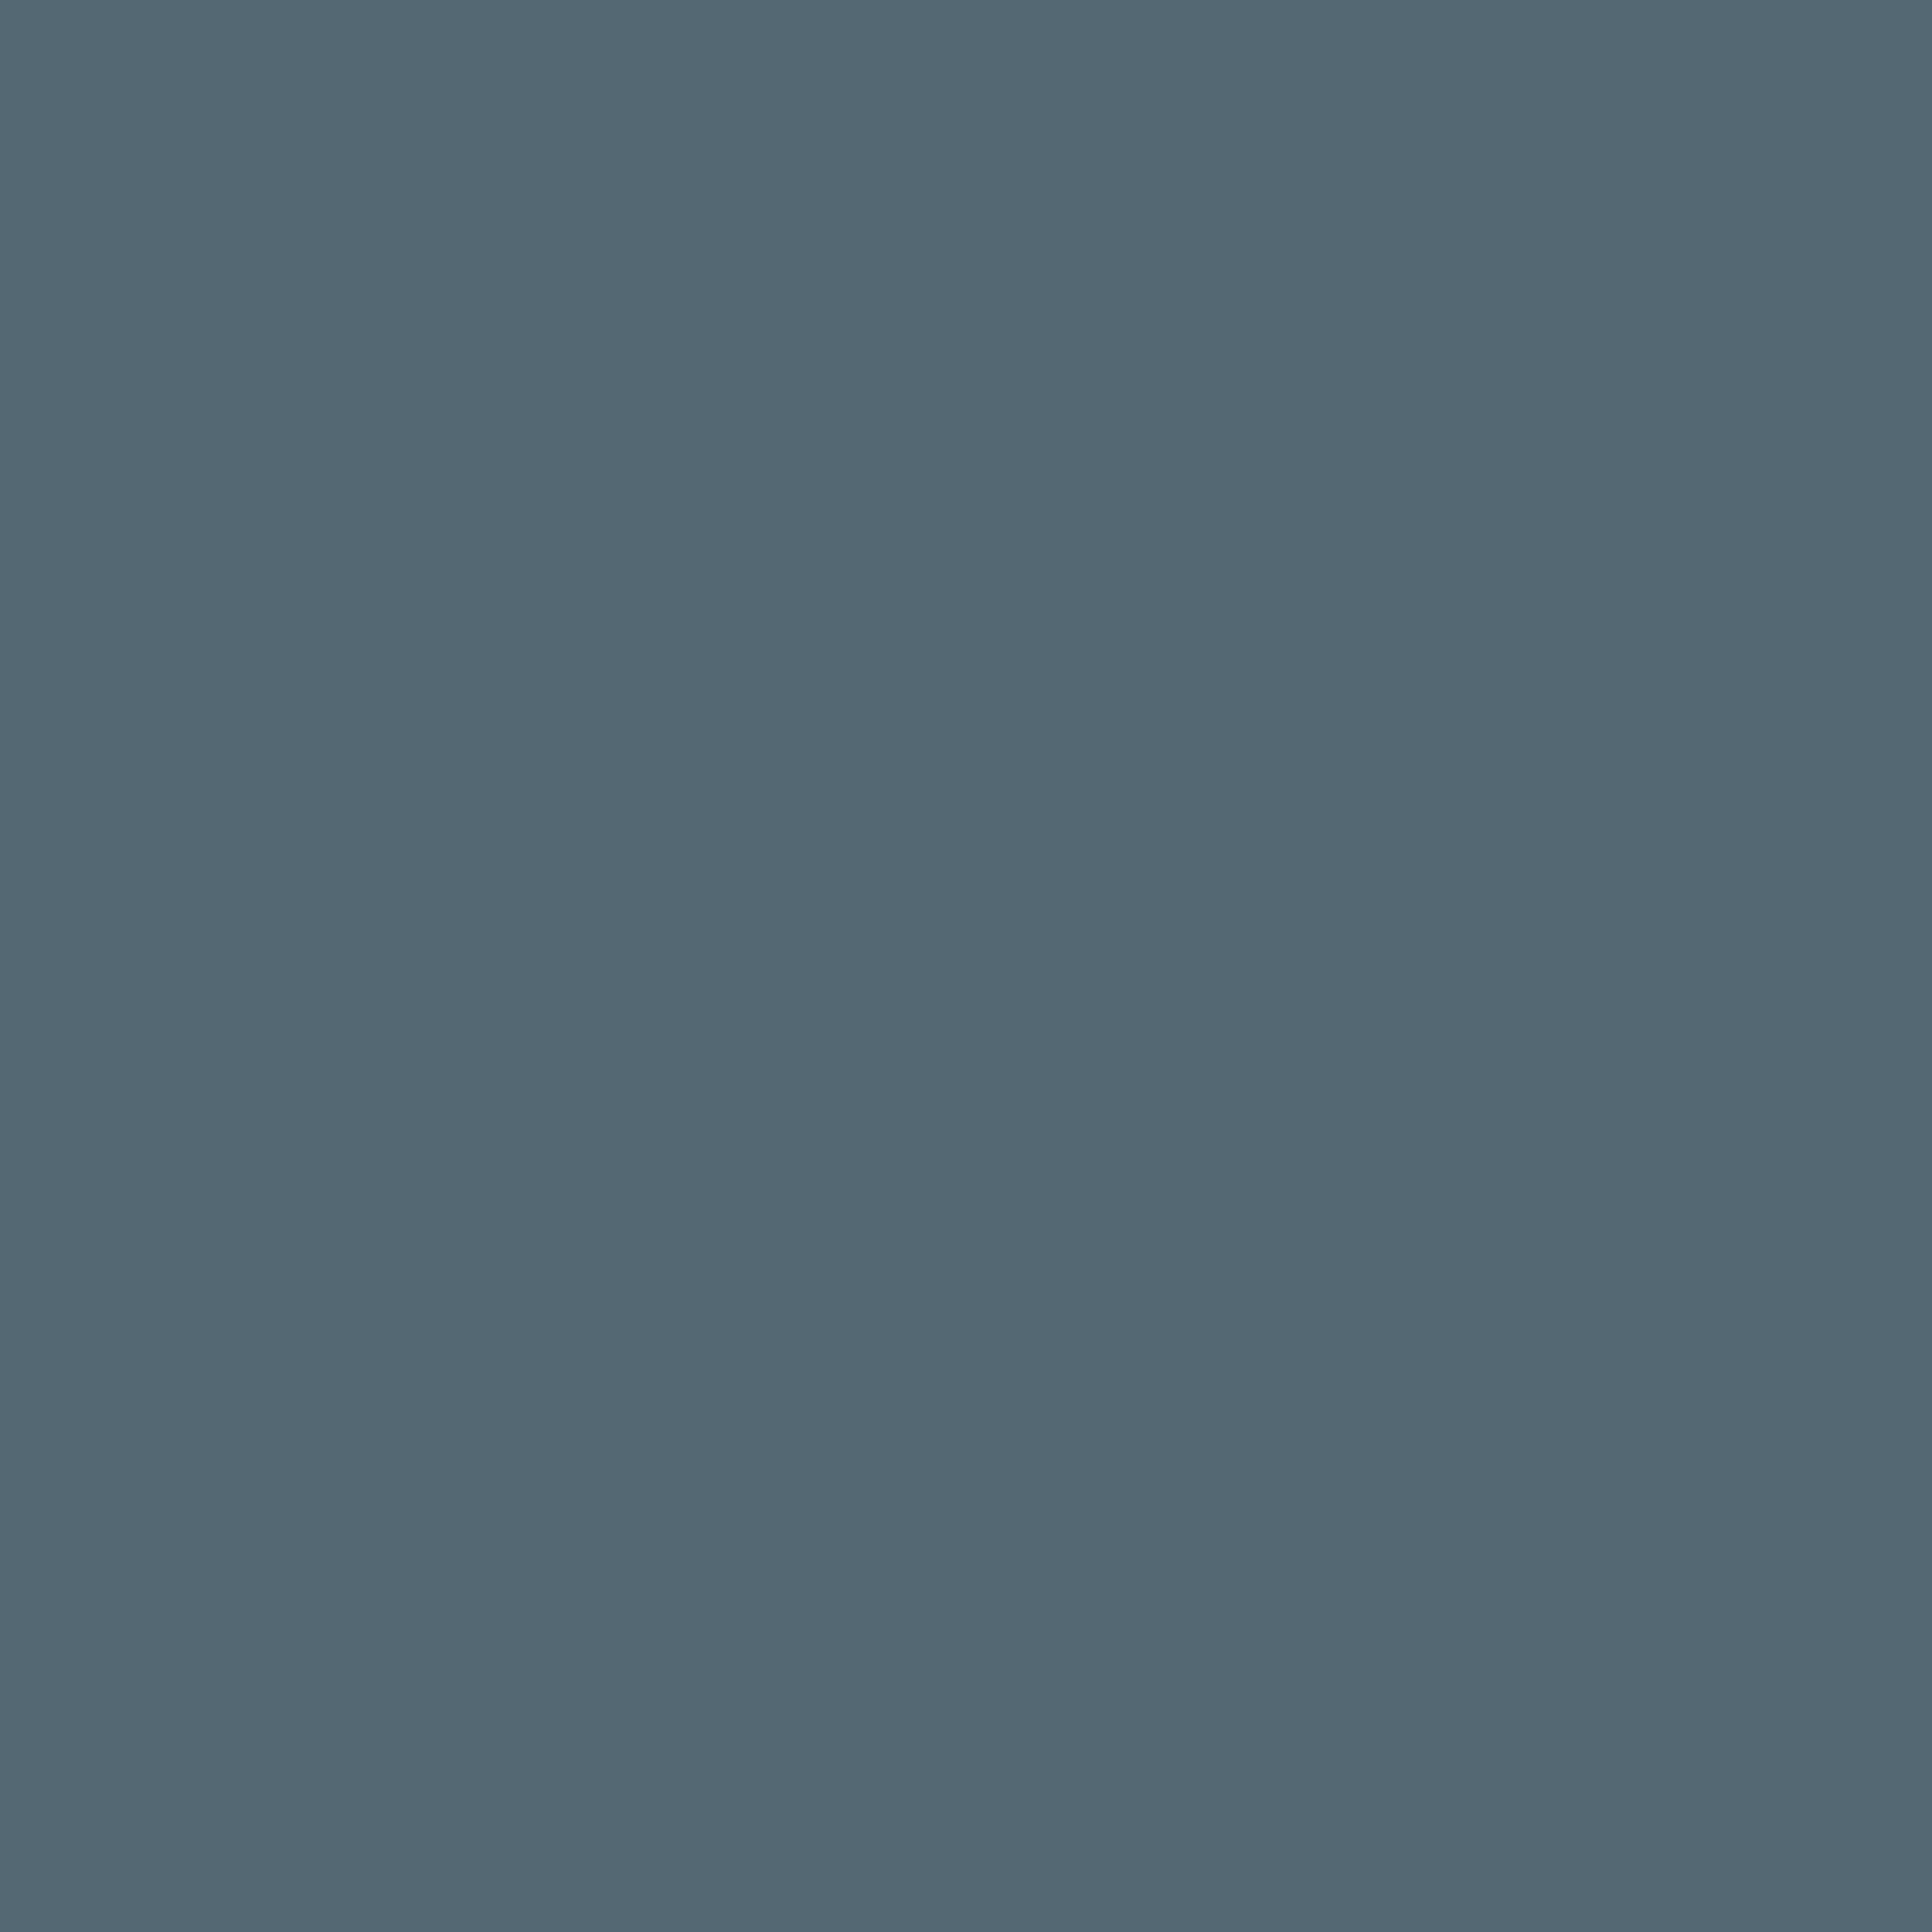 2048x2048 Cadet Solid Color Background